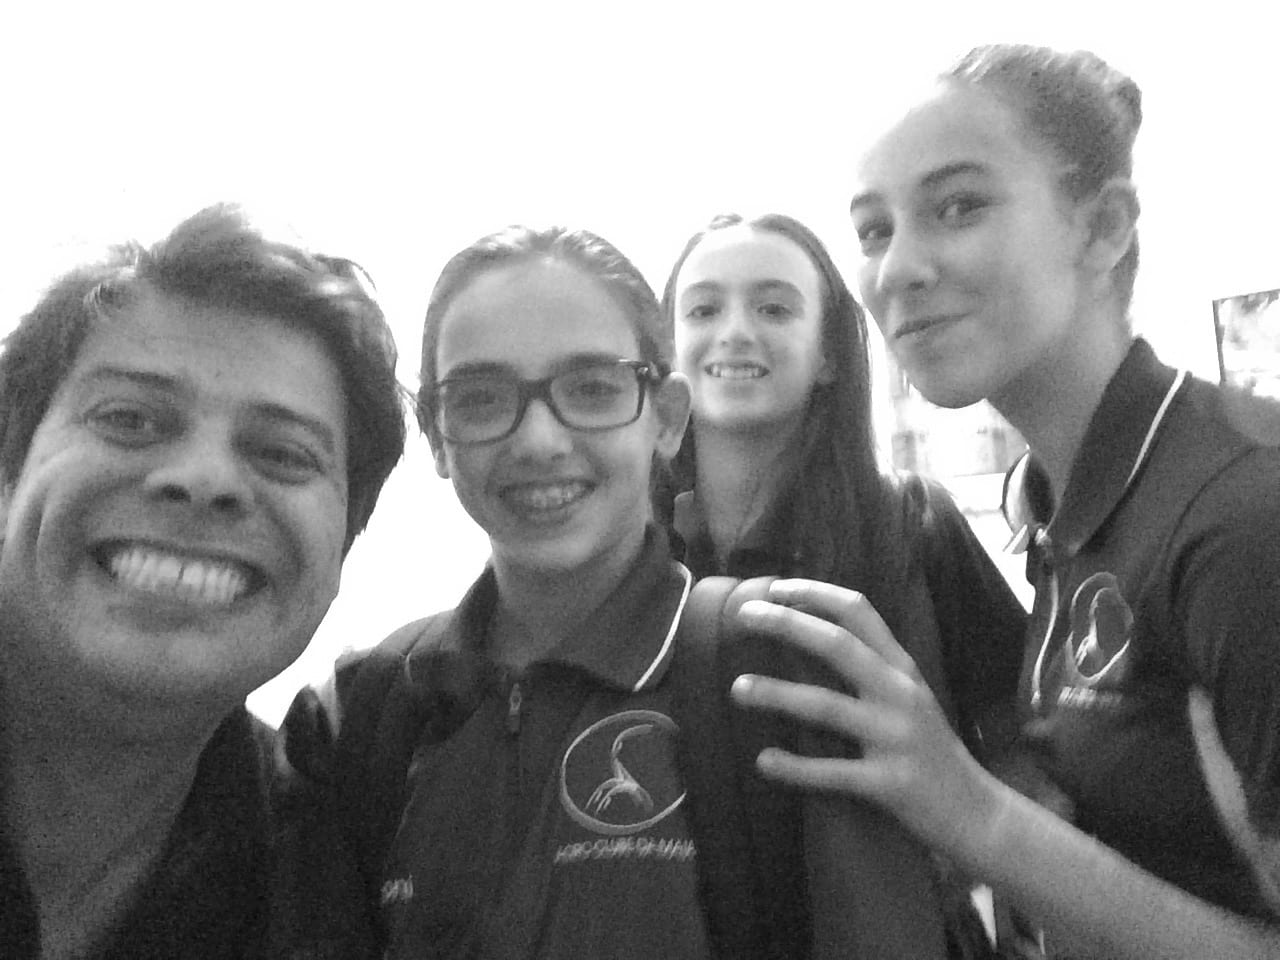 Selfie wih the gymnastics artists Bruna Gonçalves, Rita Teixeira, Maria Pia Martins from Acro Clube Maia.